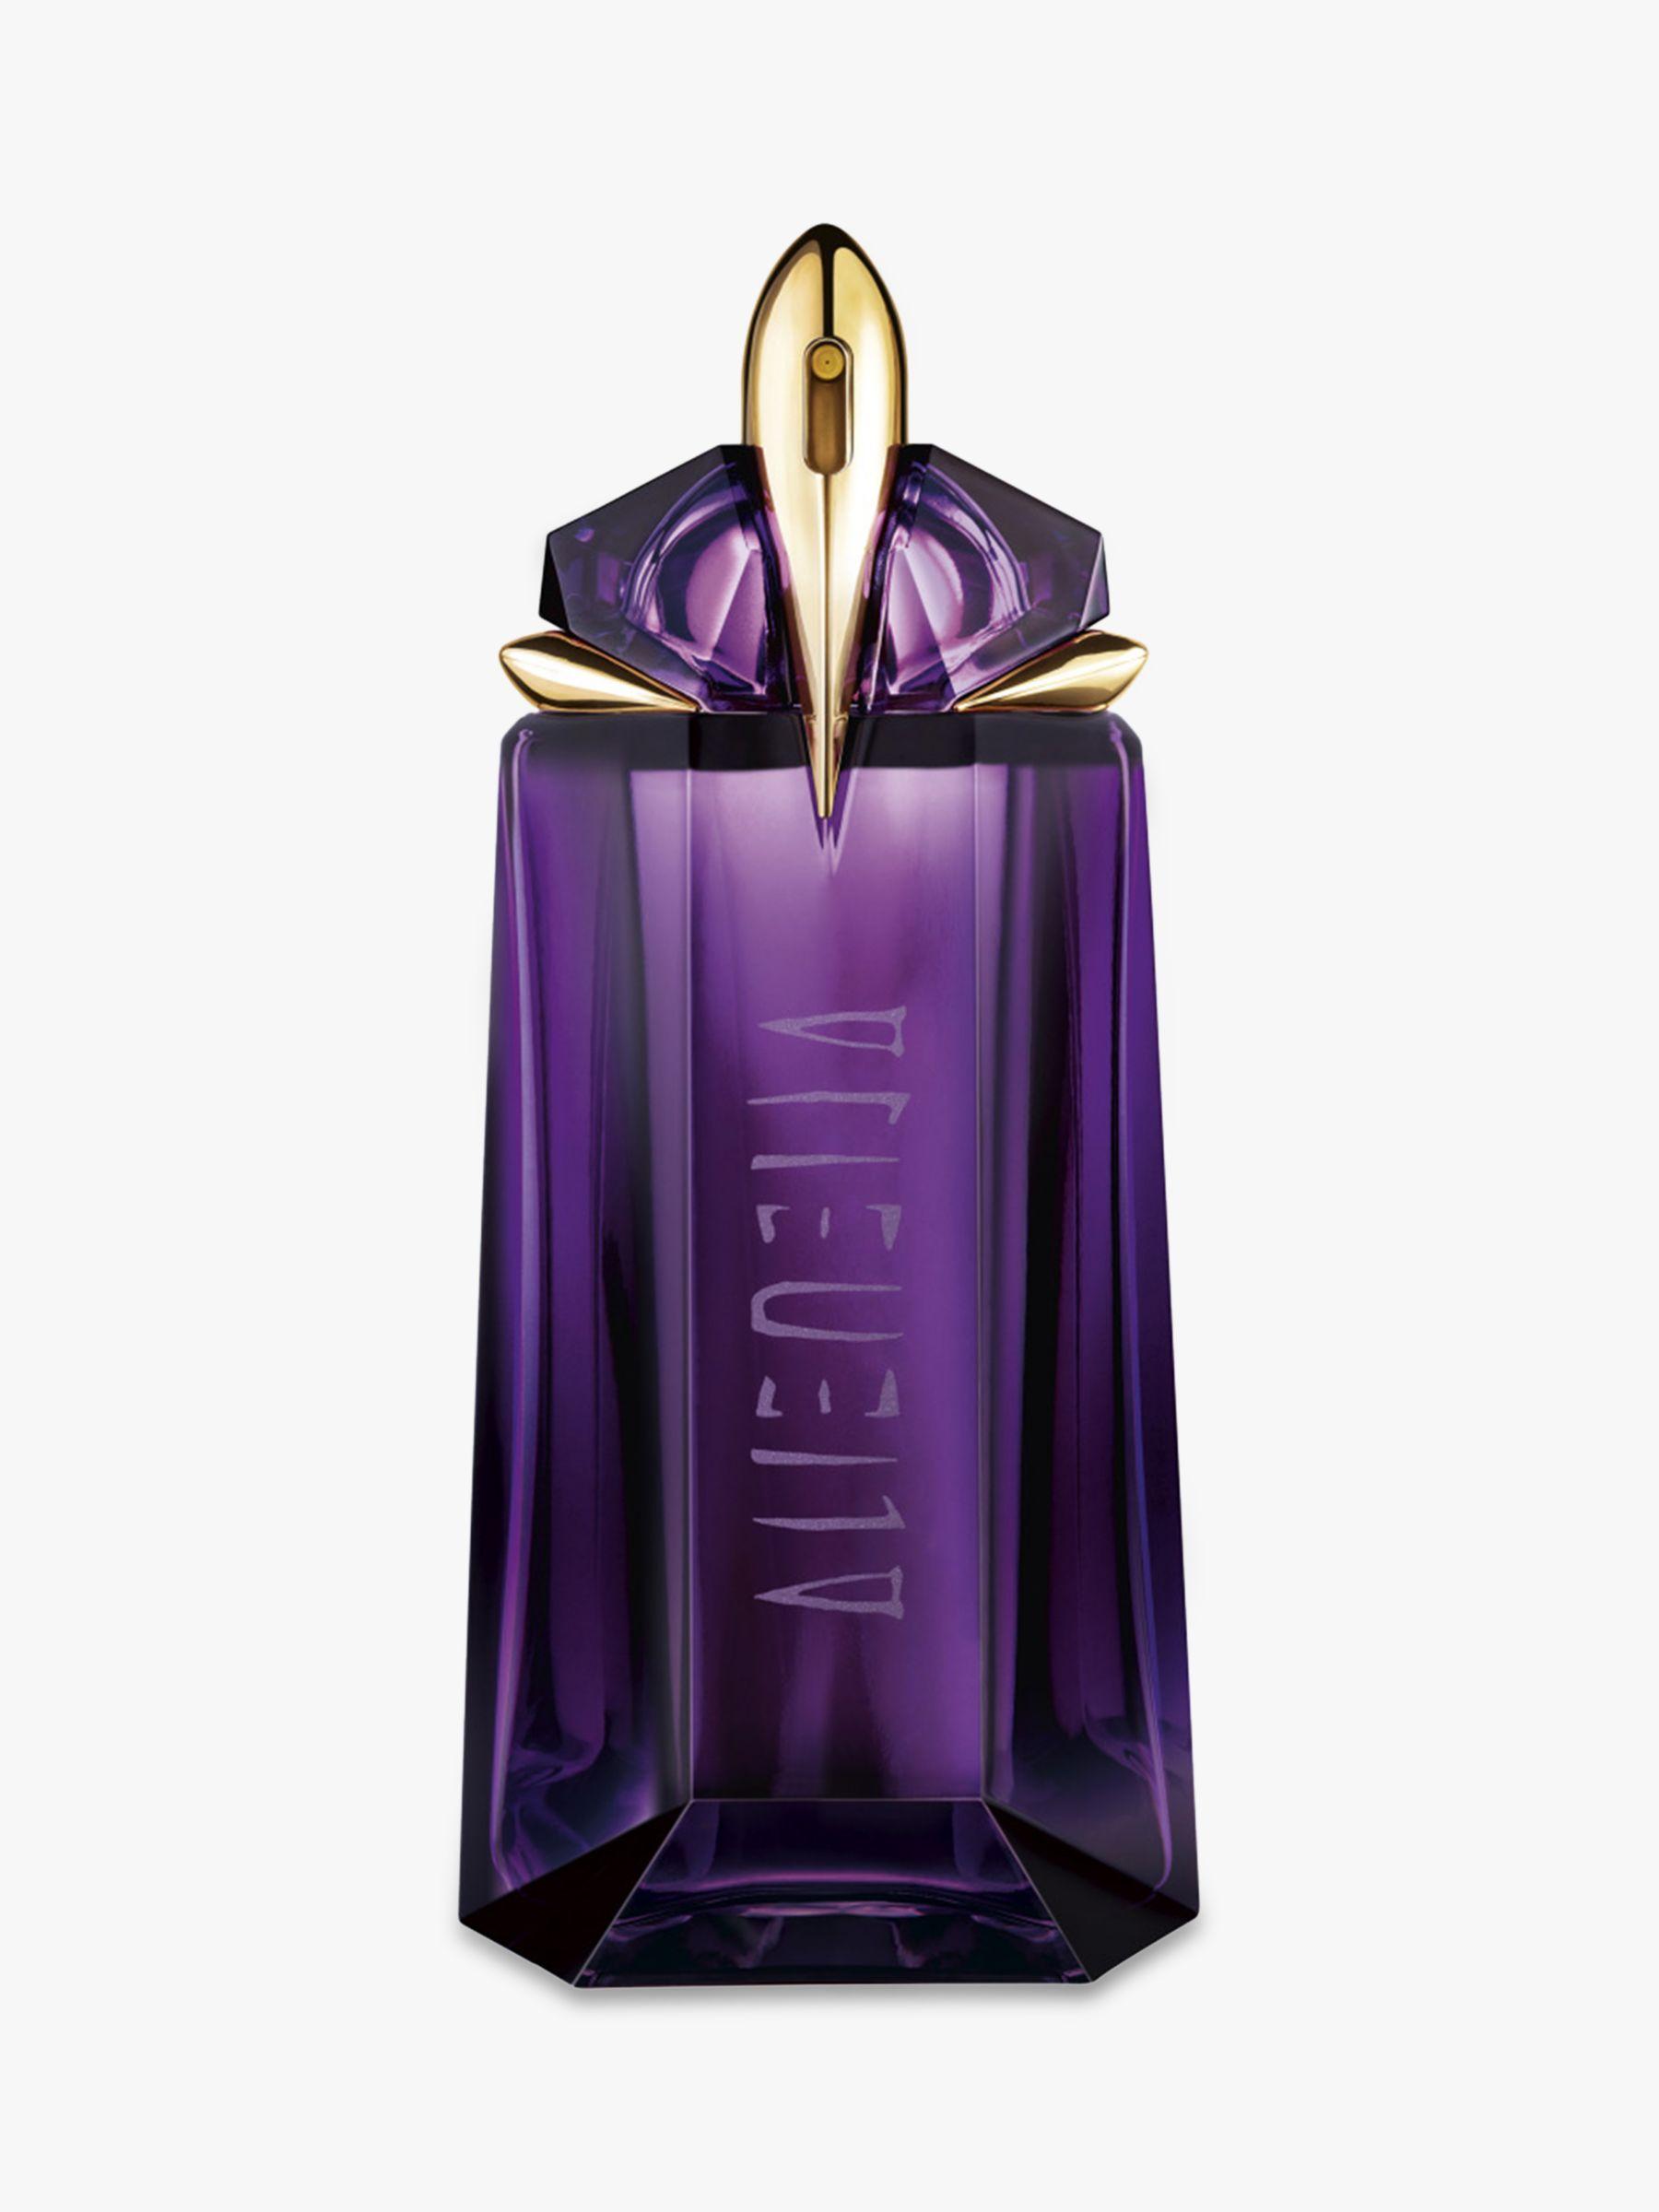 Mugler Mugler Alien Eau de Parfum Natural Spray Refillable, 90ml